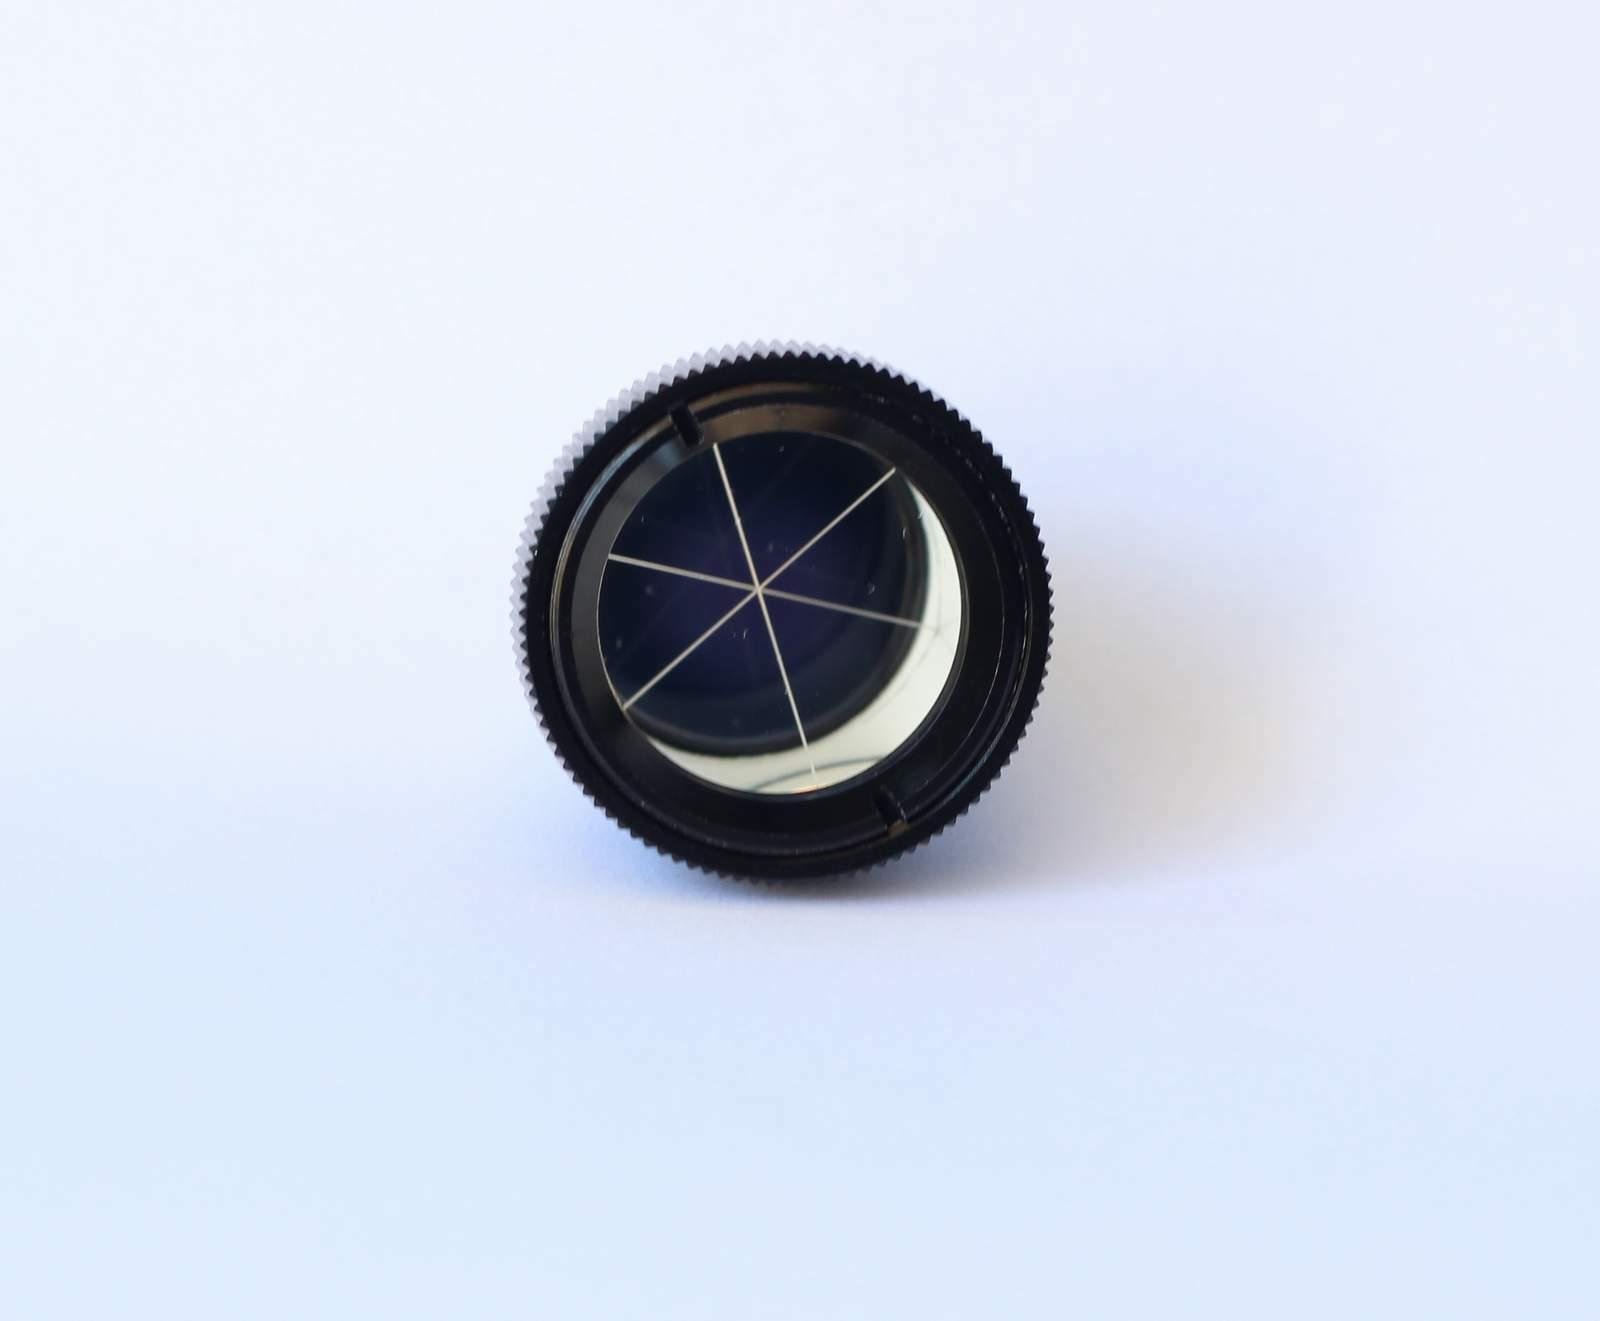 NEW 2pcs Mini Peanut Prism Replacement For mini prism Surveying total stations